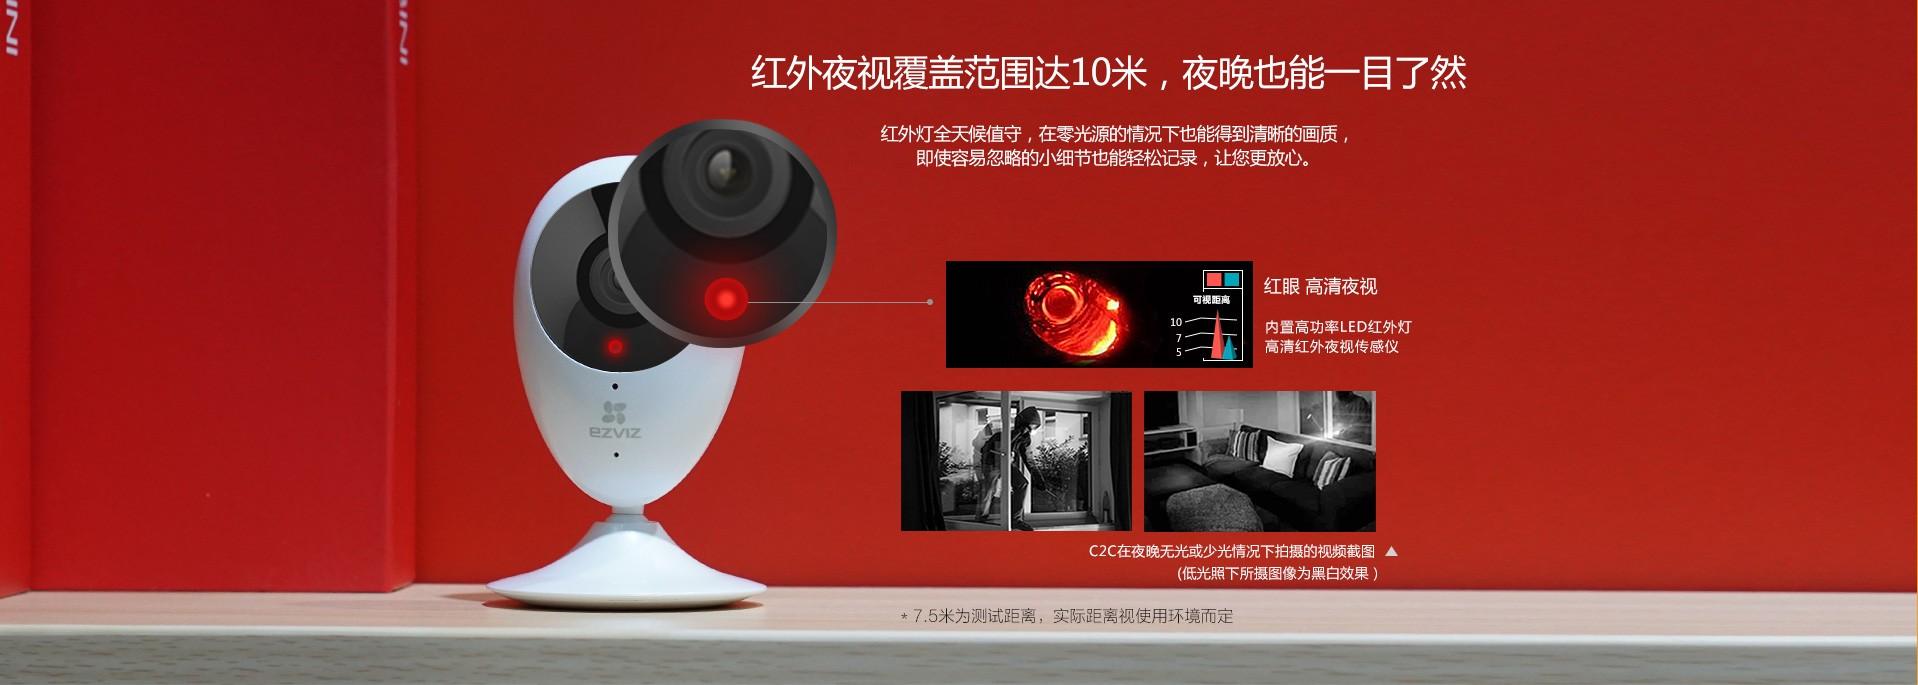 C2C-1080P-WEB.jpg